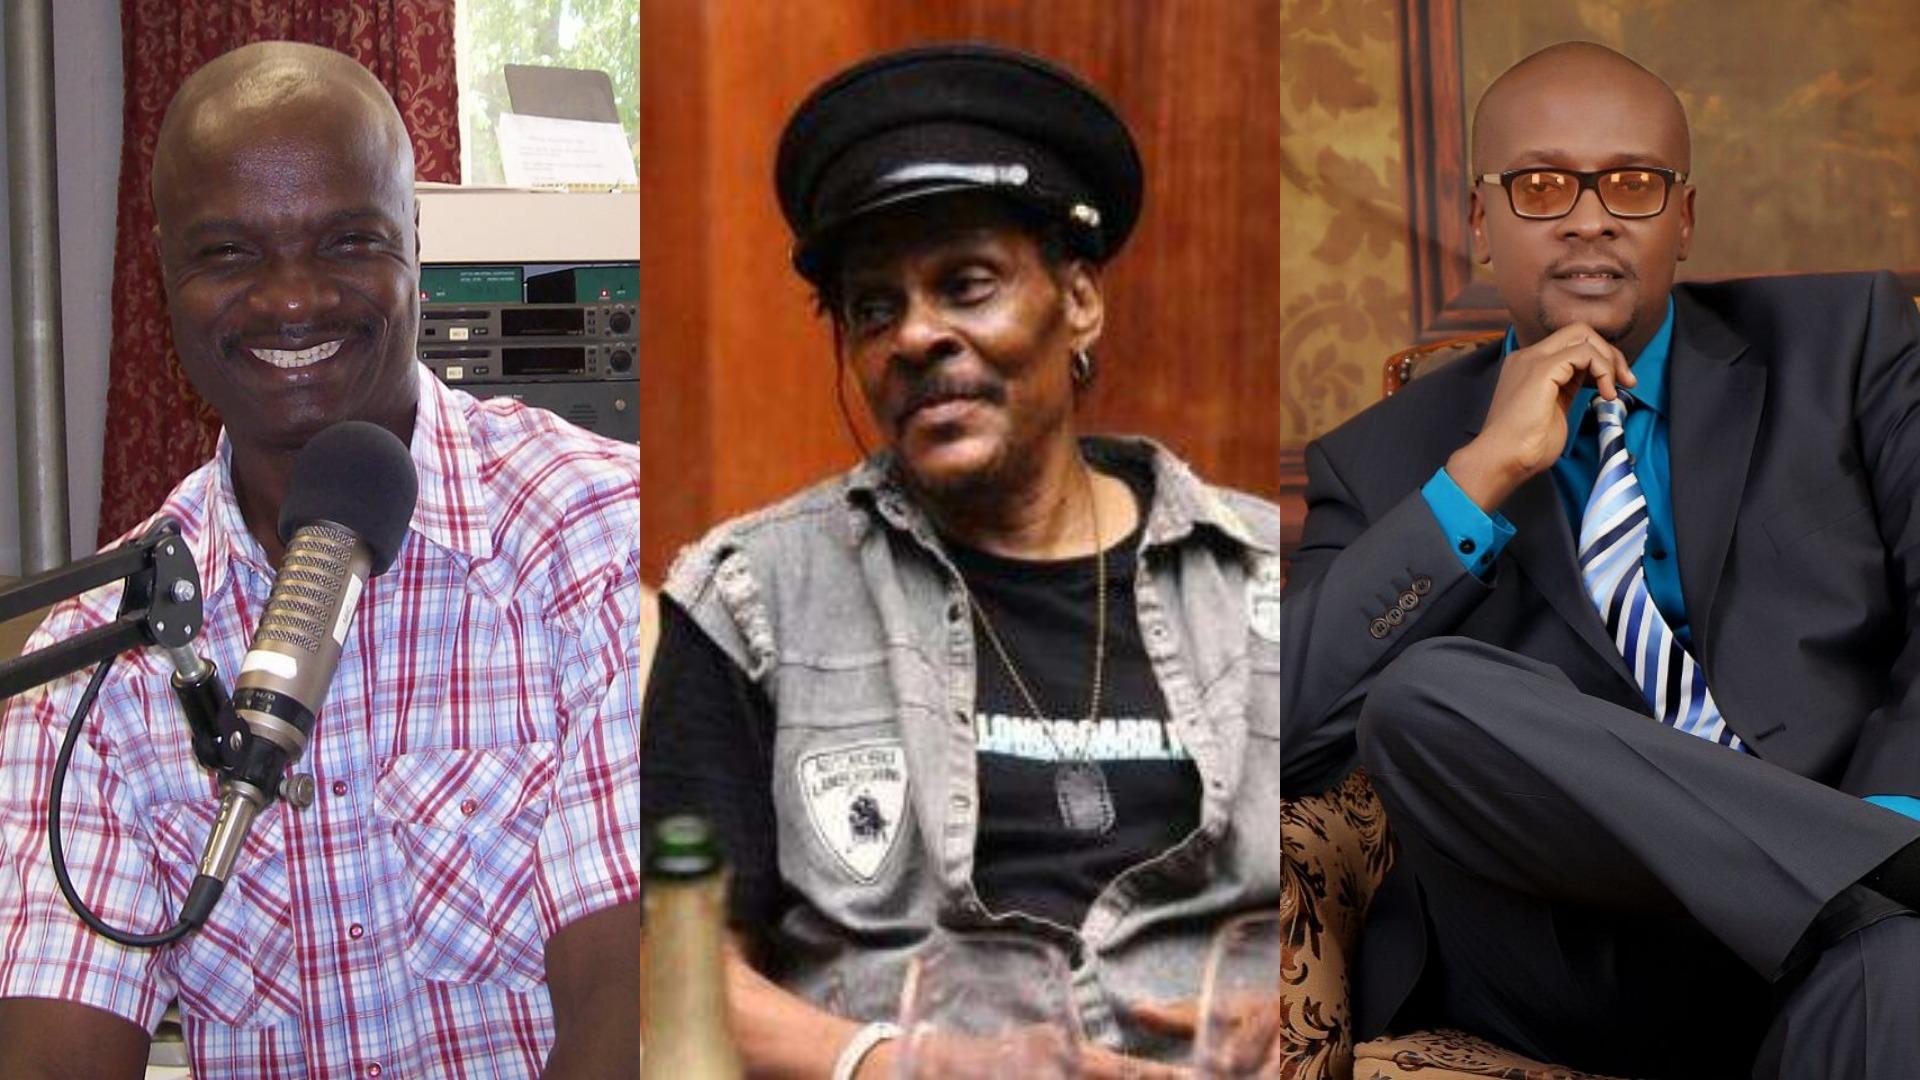 Majek Fashek accuses former friends Charles Novia and Azuka Jebose of defrauding him